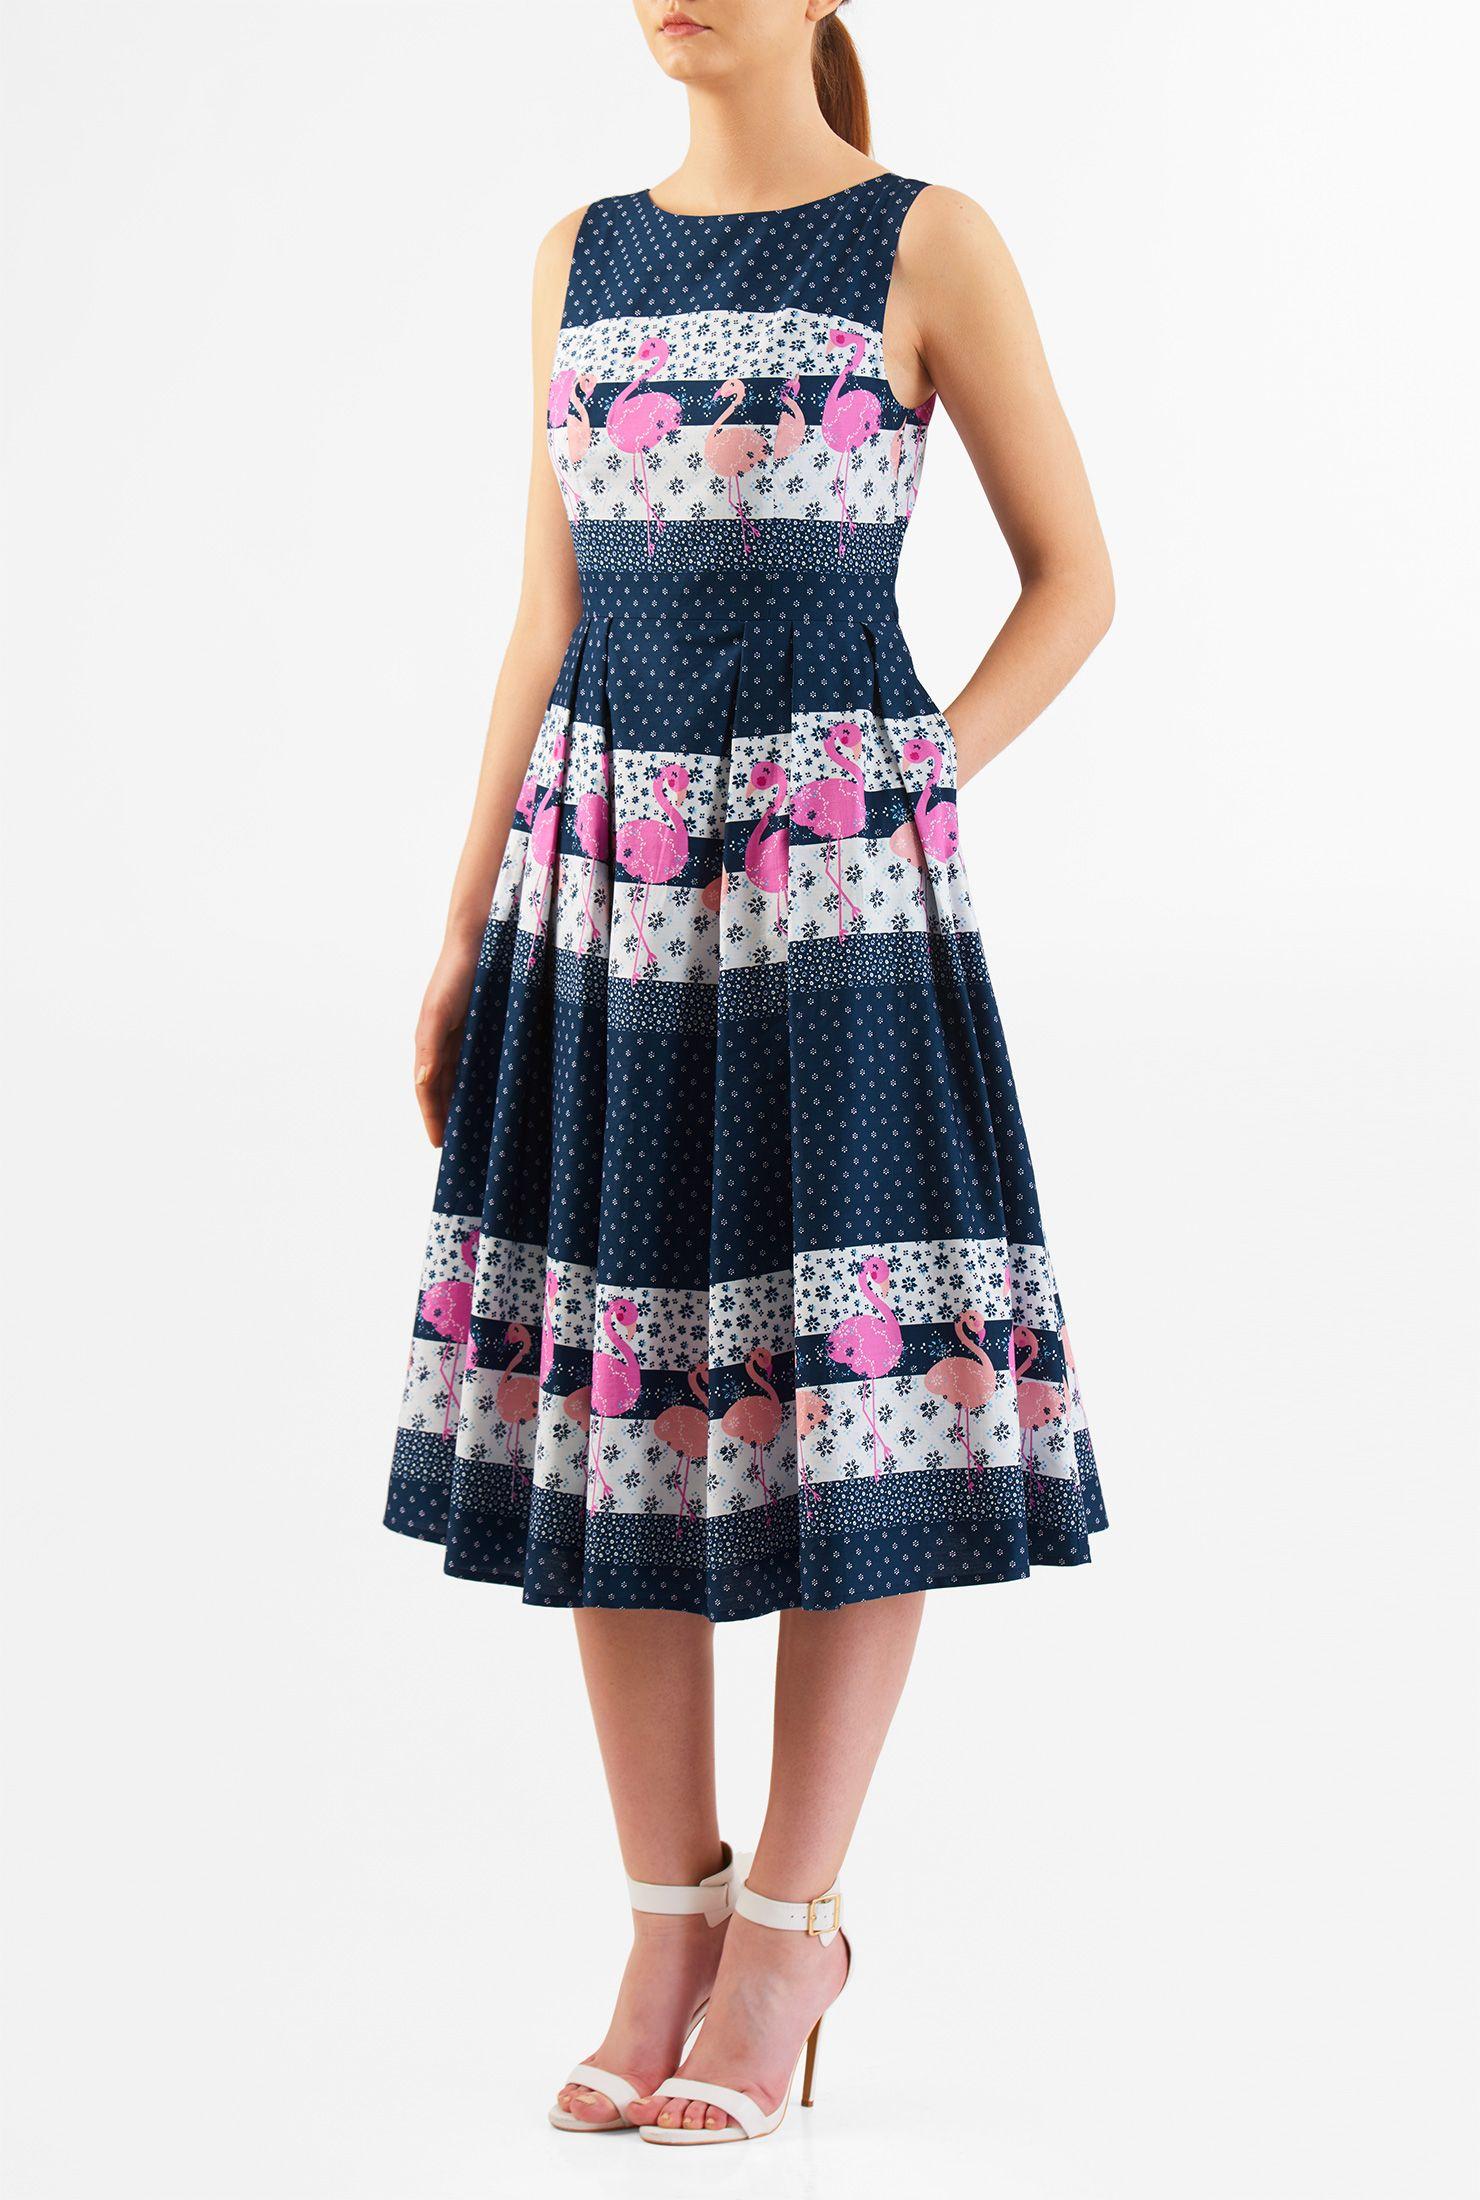 79c3f763c37808 eShakti - Flamingo Print Cotton Midi Dress